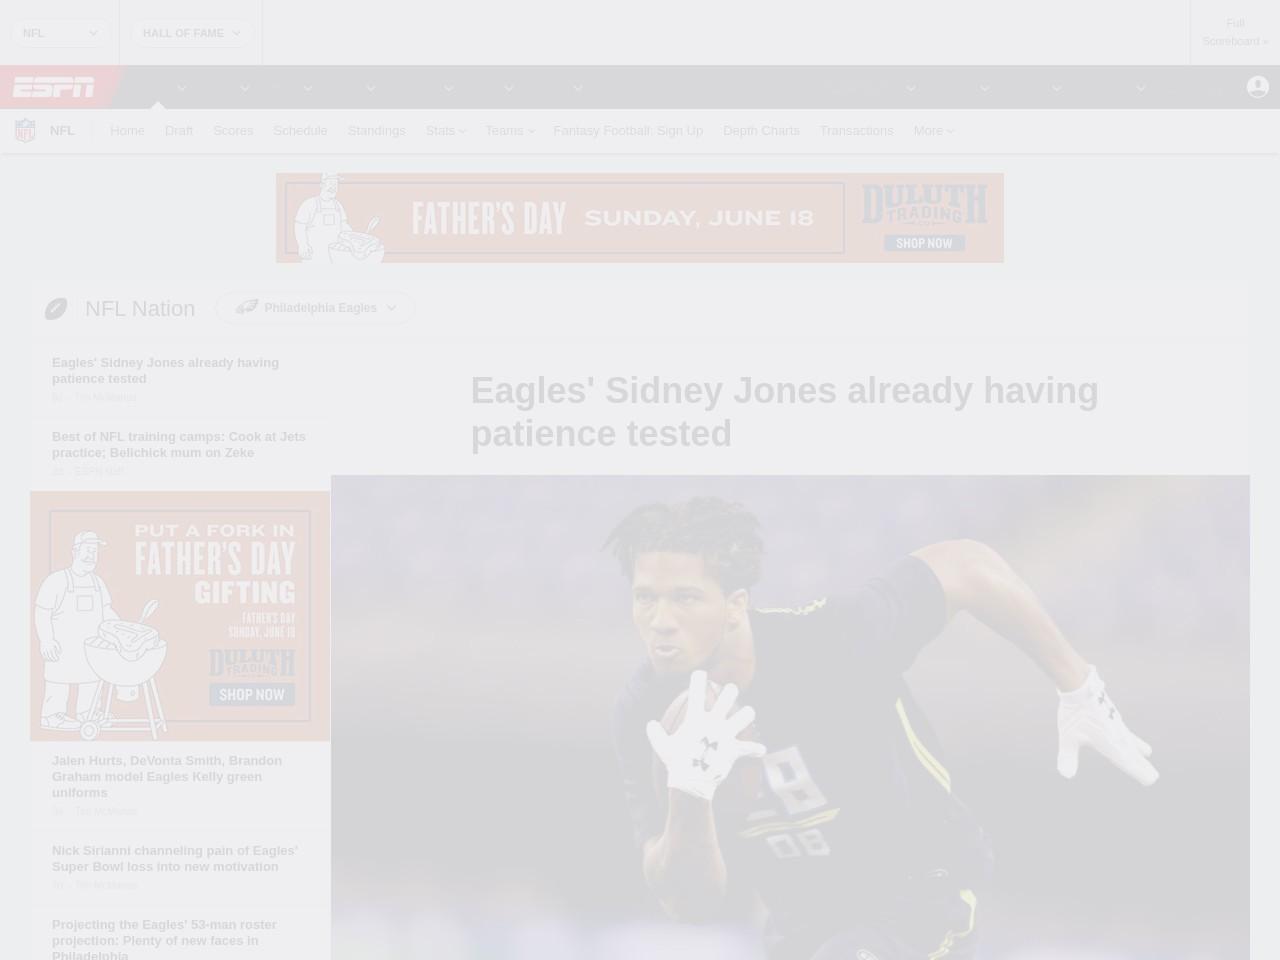 Eagles' Sidney Jones already having patience tested